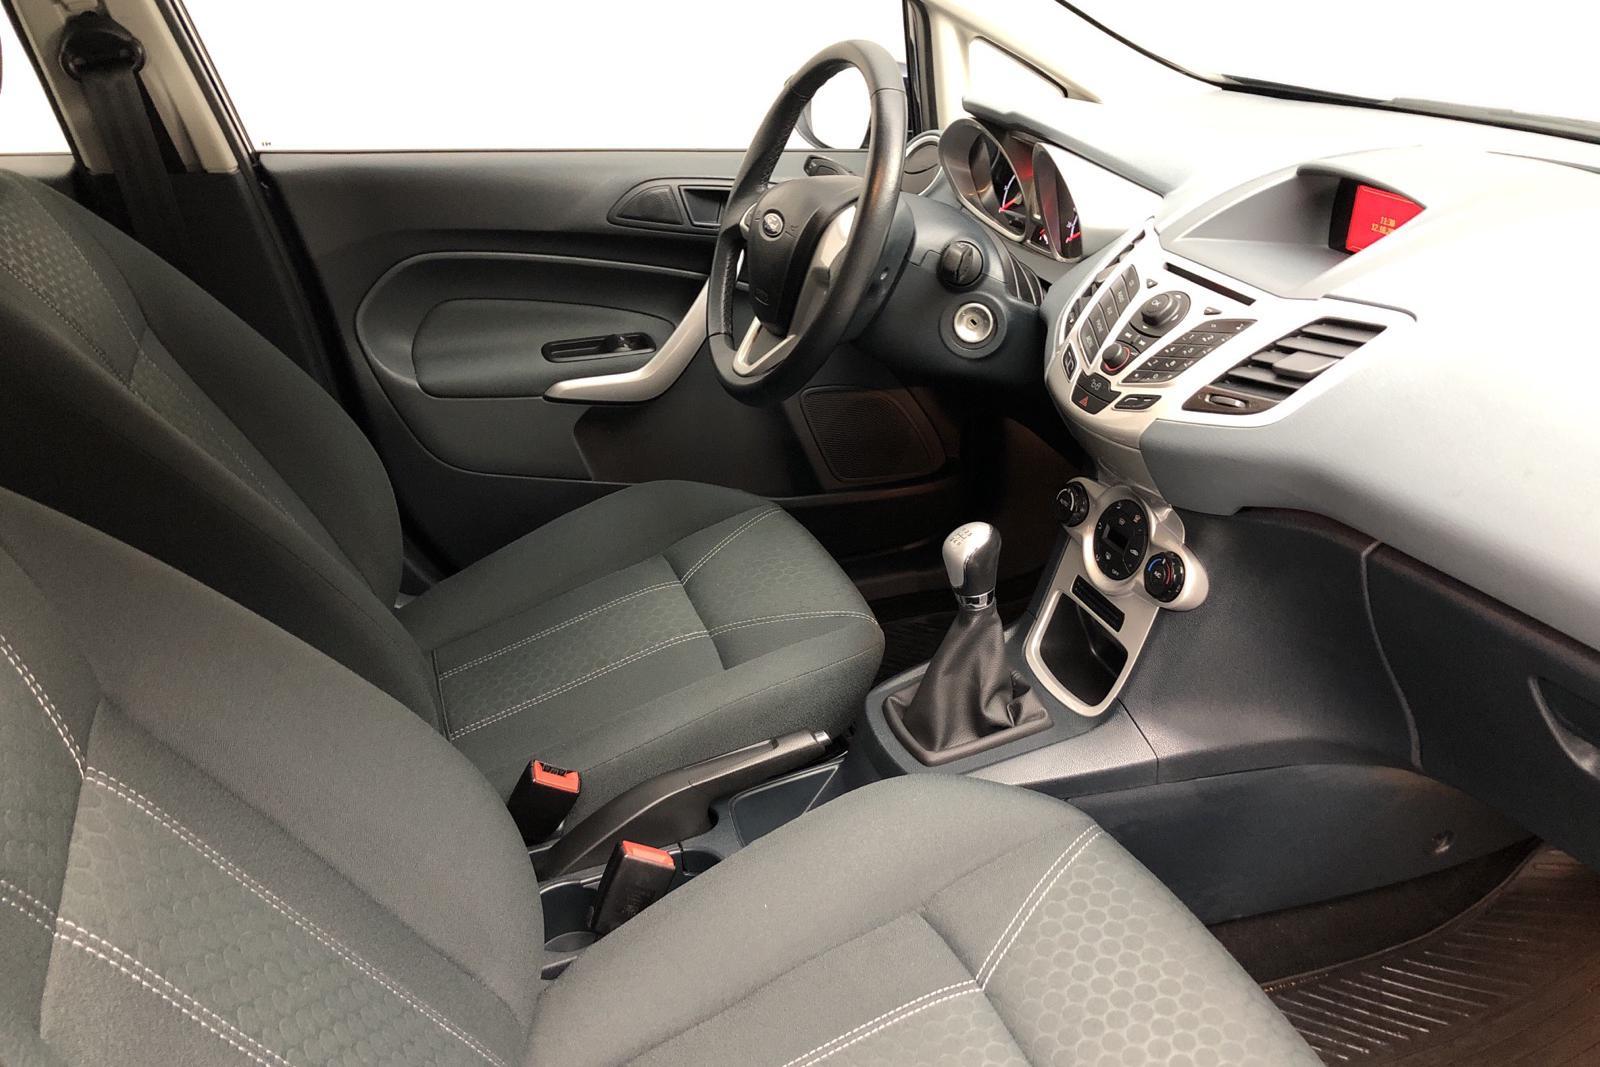 Ford Fiesta 1.25 5dr (82hk) - 38 000 km - Manual - blue - 2011